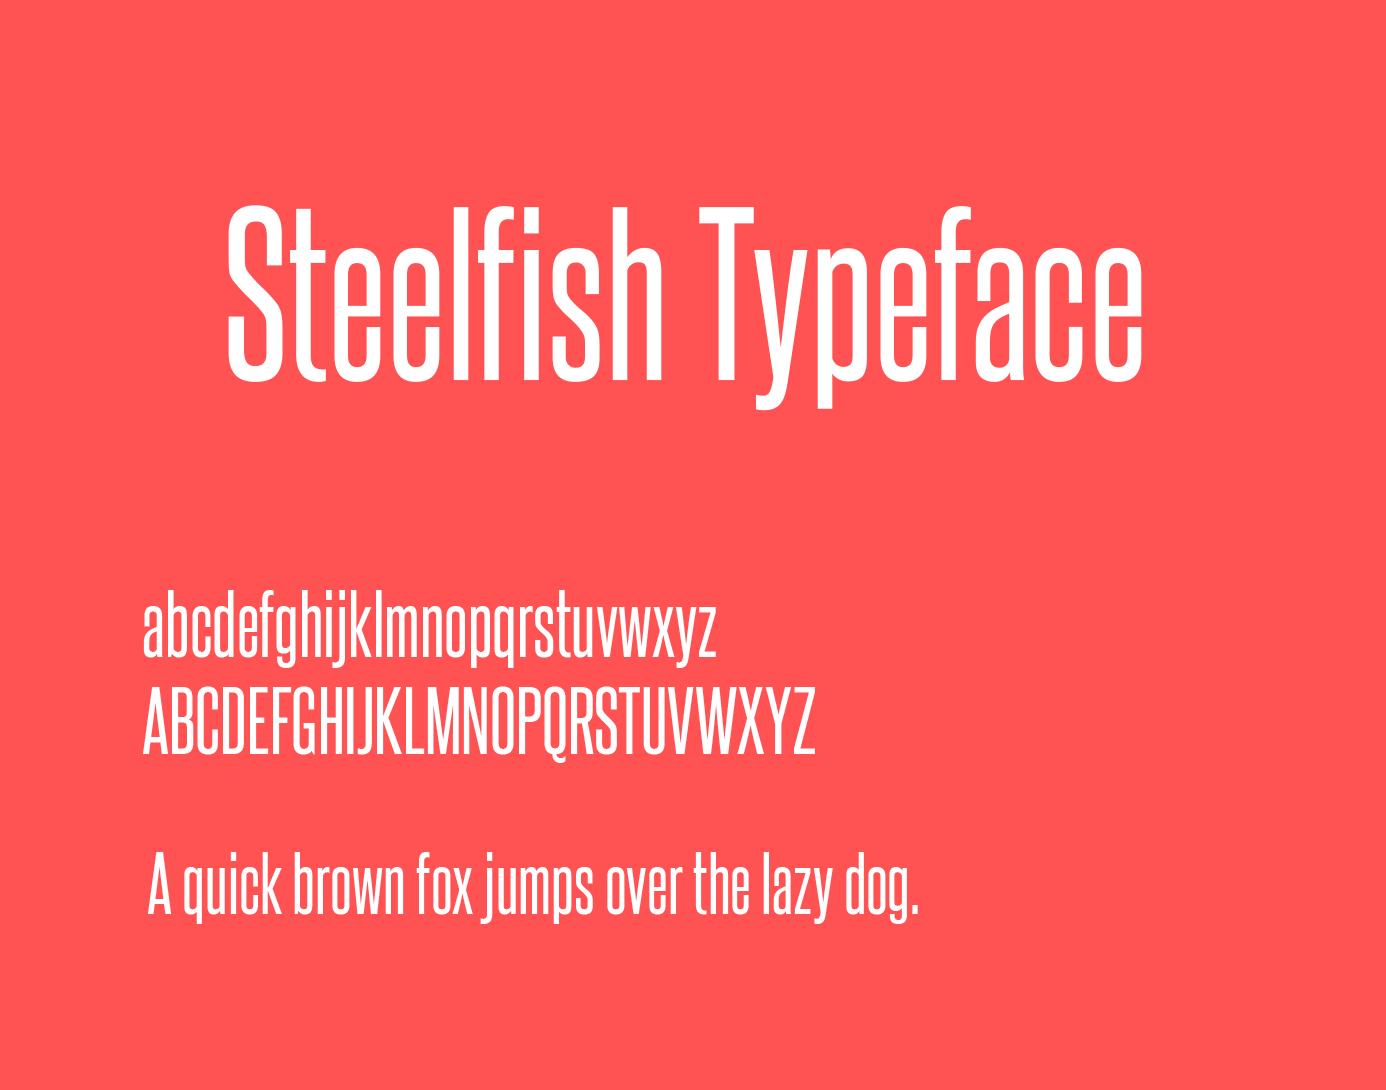 steelfish-font